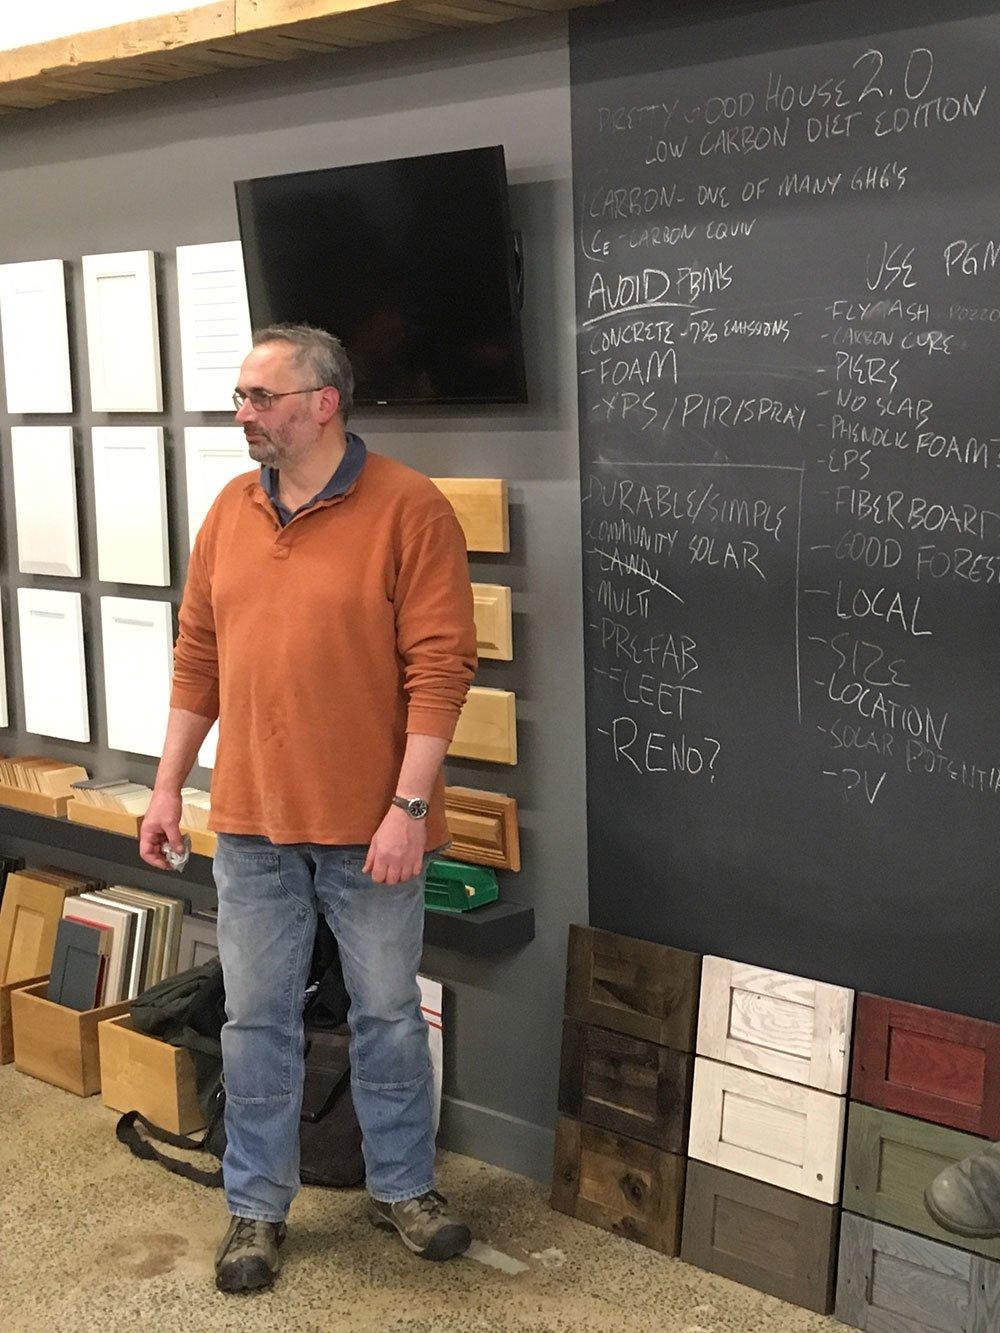 Dan Kolbert at a Pretty Good House meeting